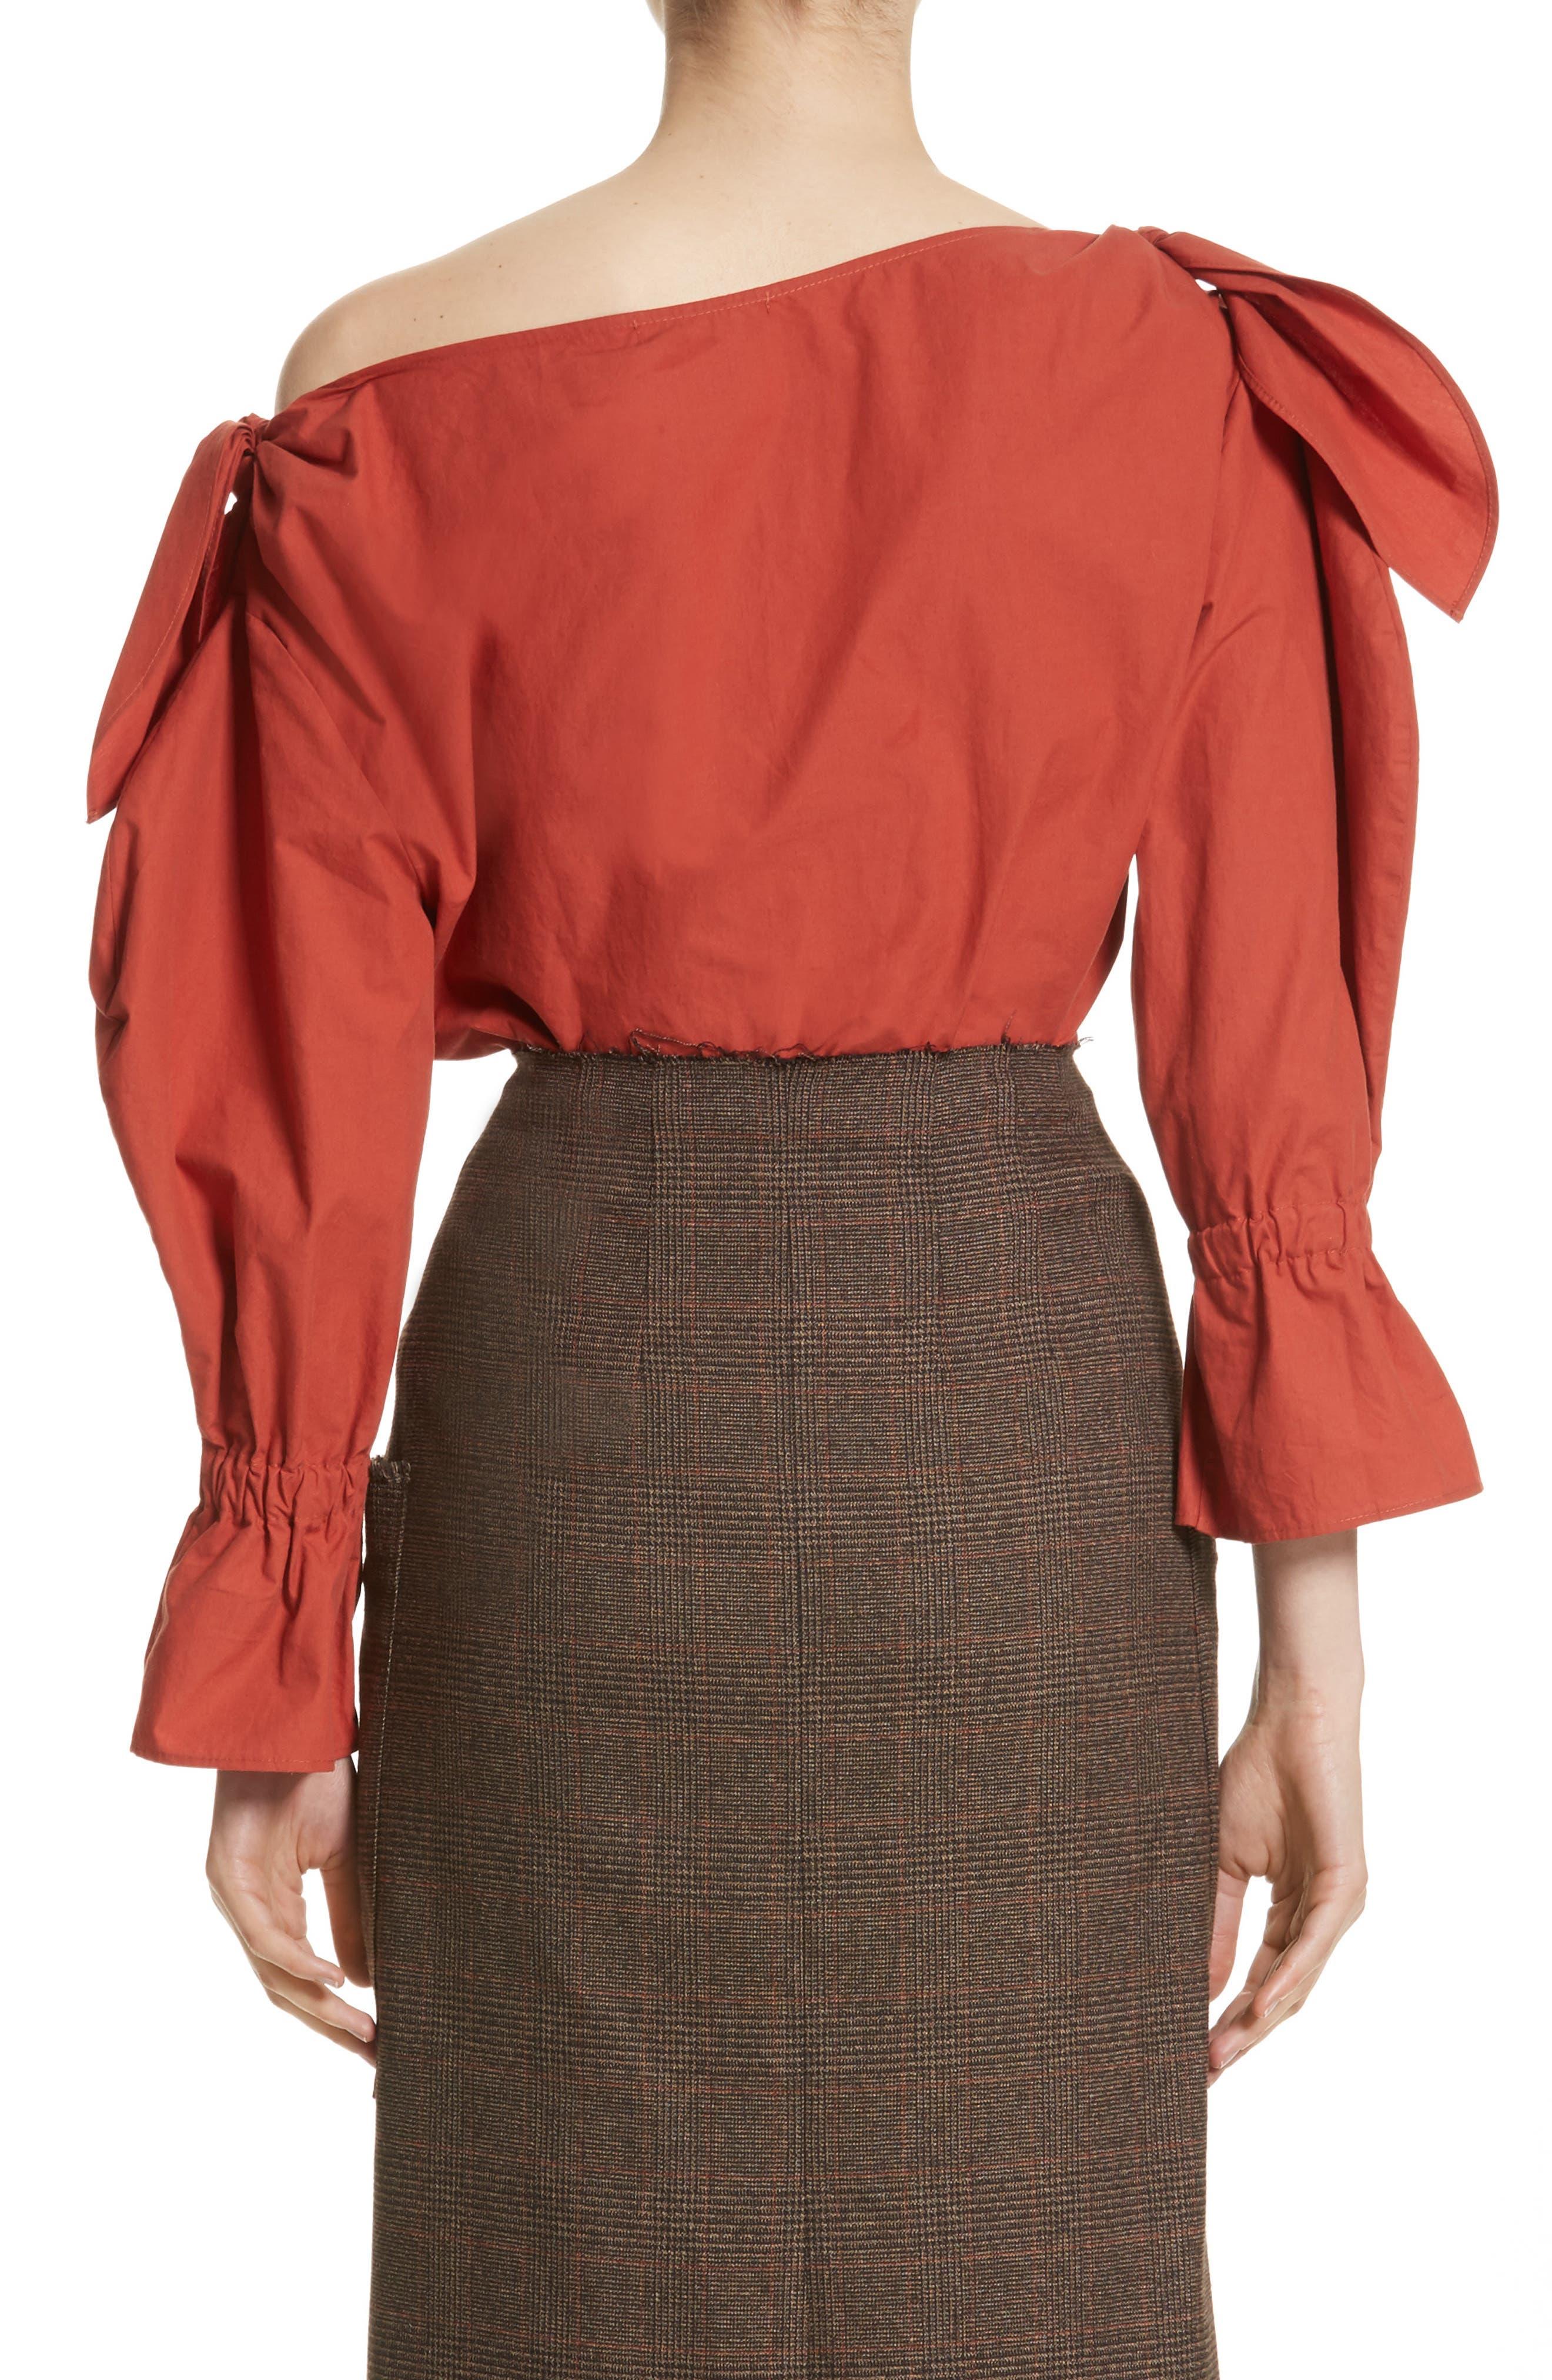 Michelle One-Shoulder Puff Sleeve Blouse,                             Alternate thumbnail 2, color,                             810